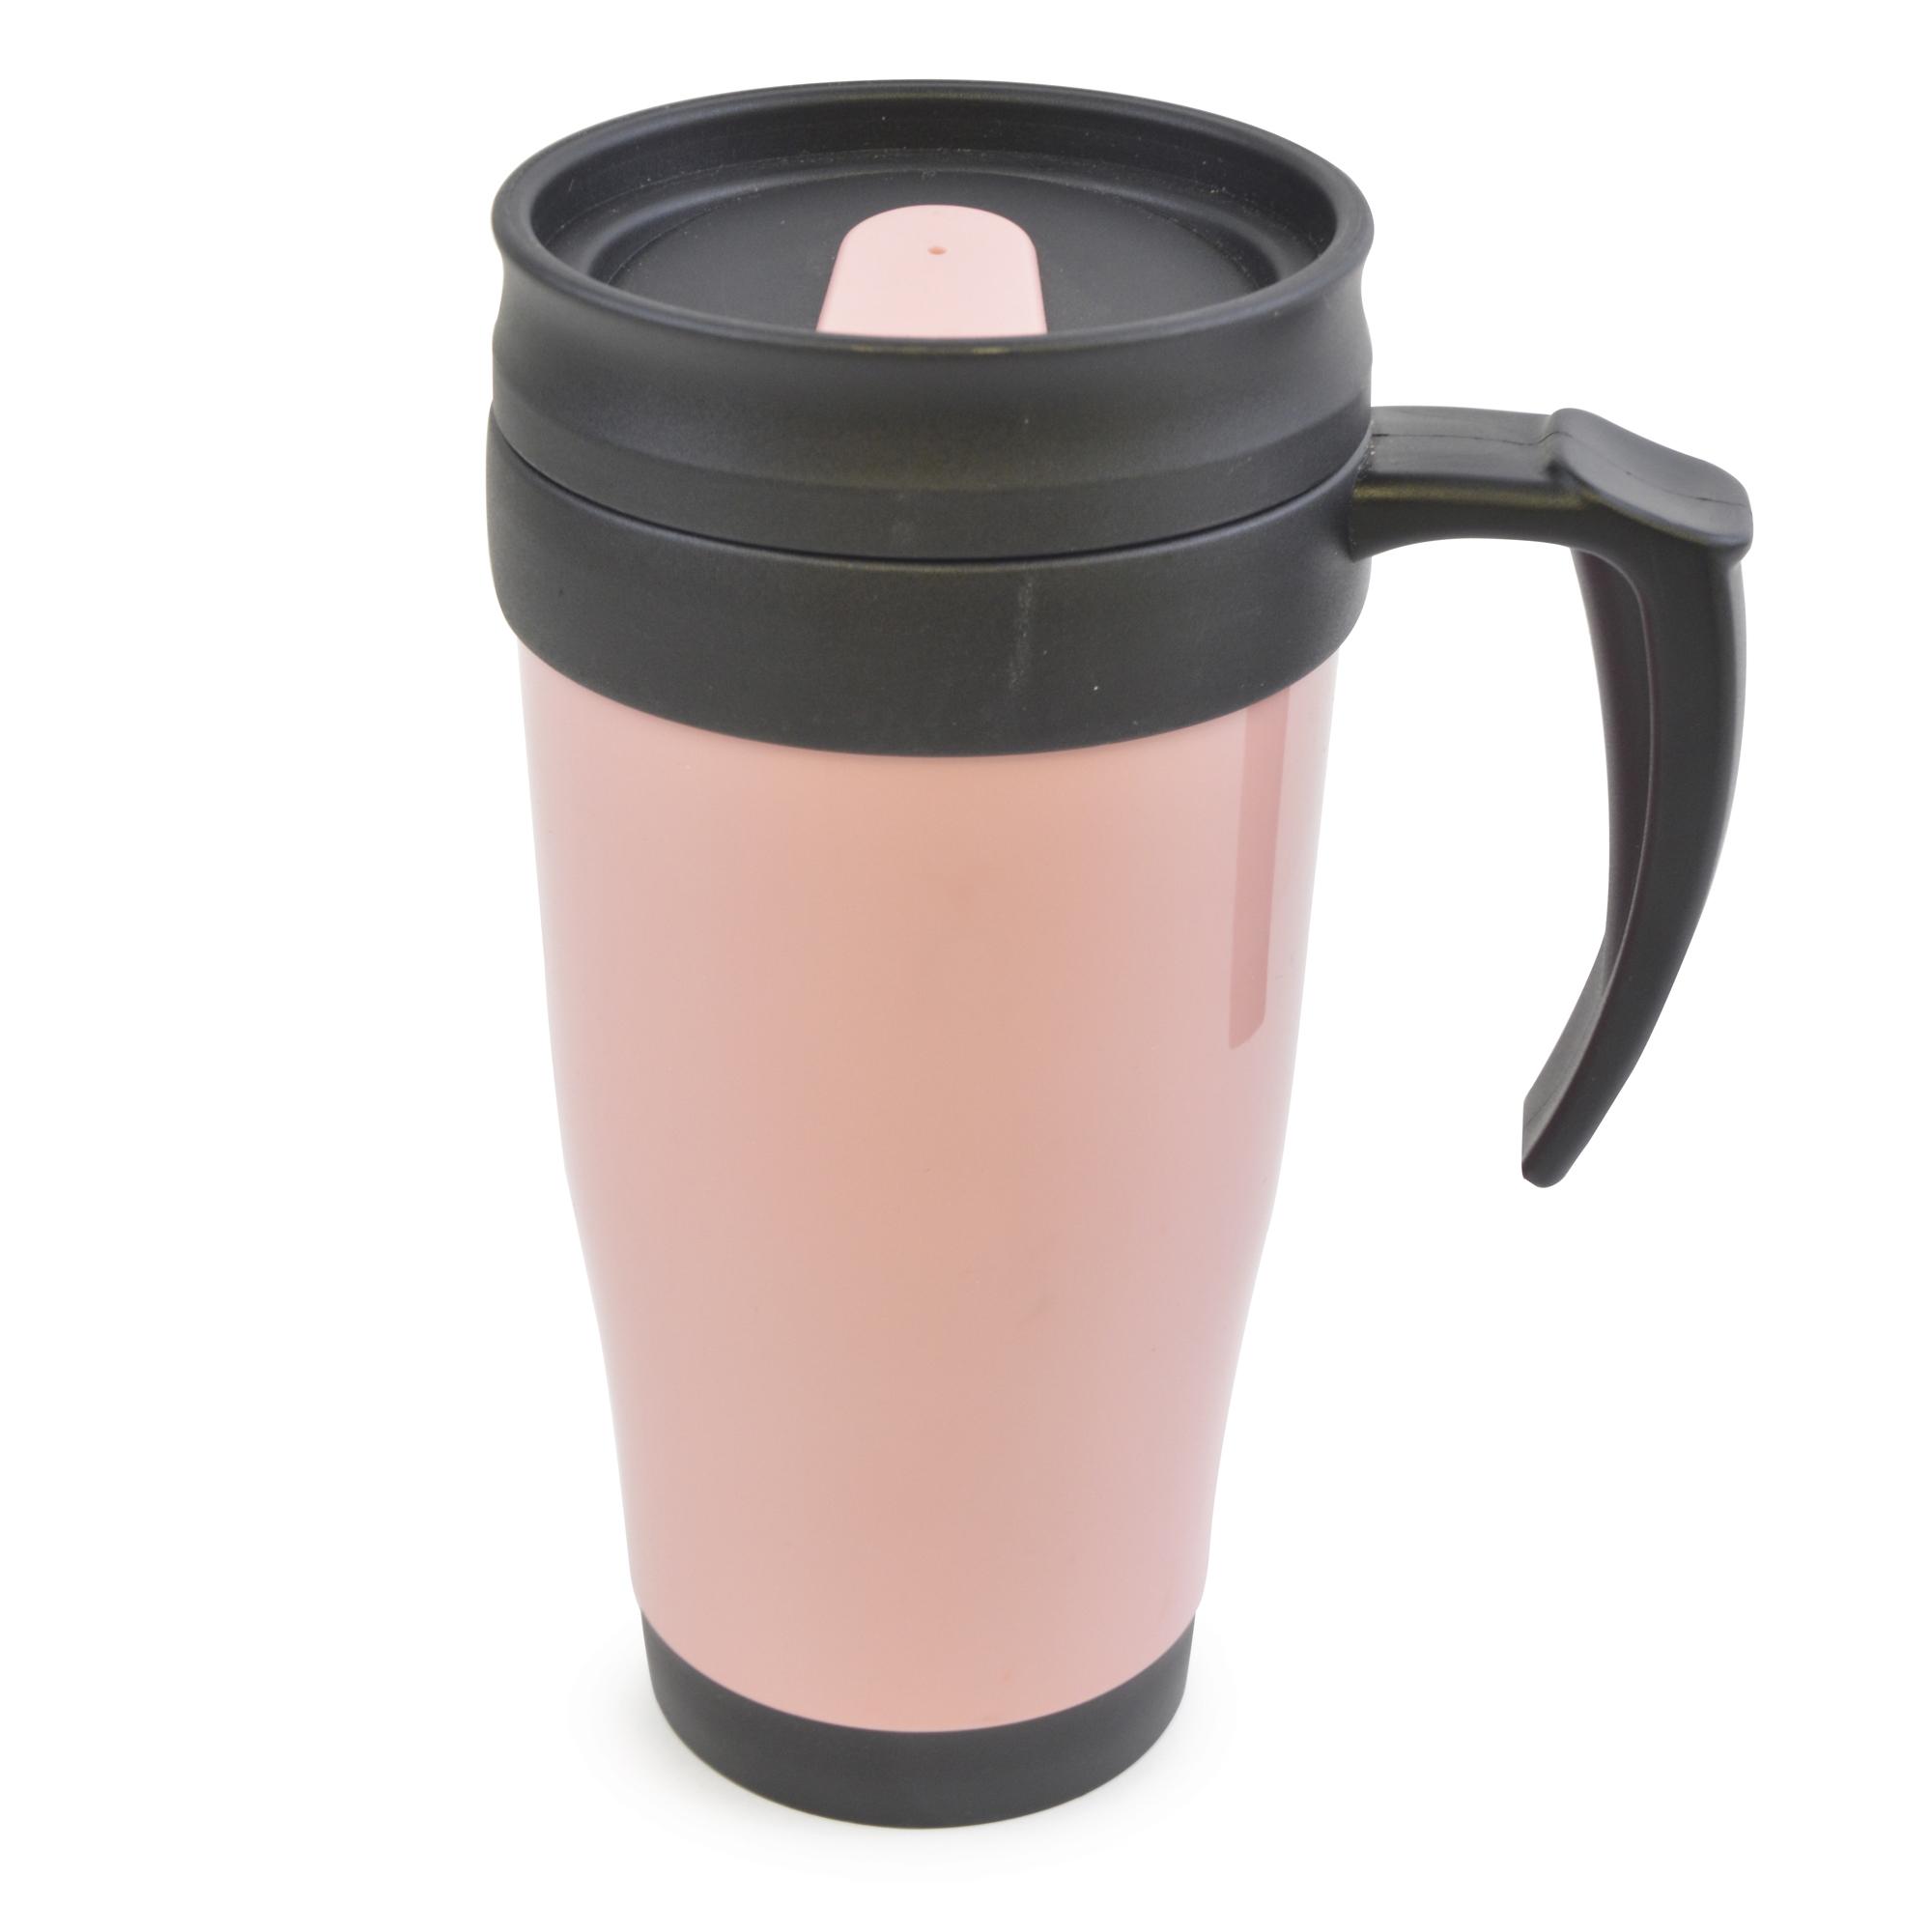 THERMAL TRAVEL MUG TEE COFFEE HOT DRINK CUP HANDLE DOUBLE ...